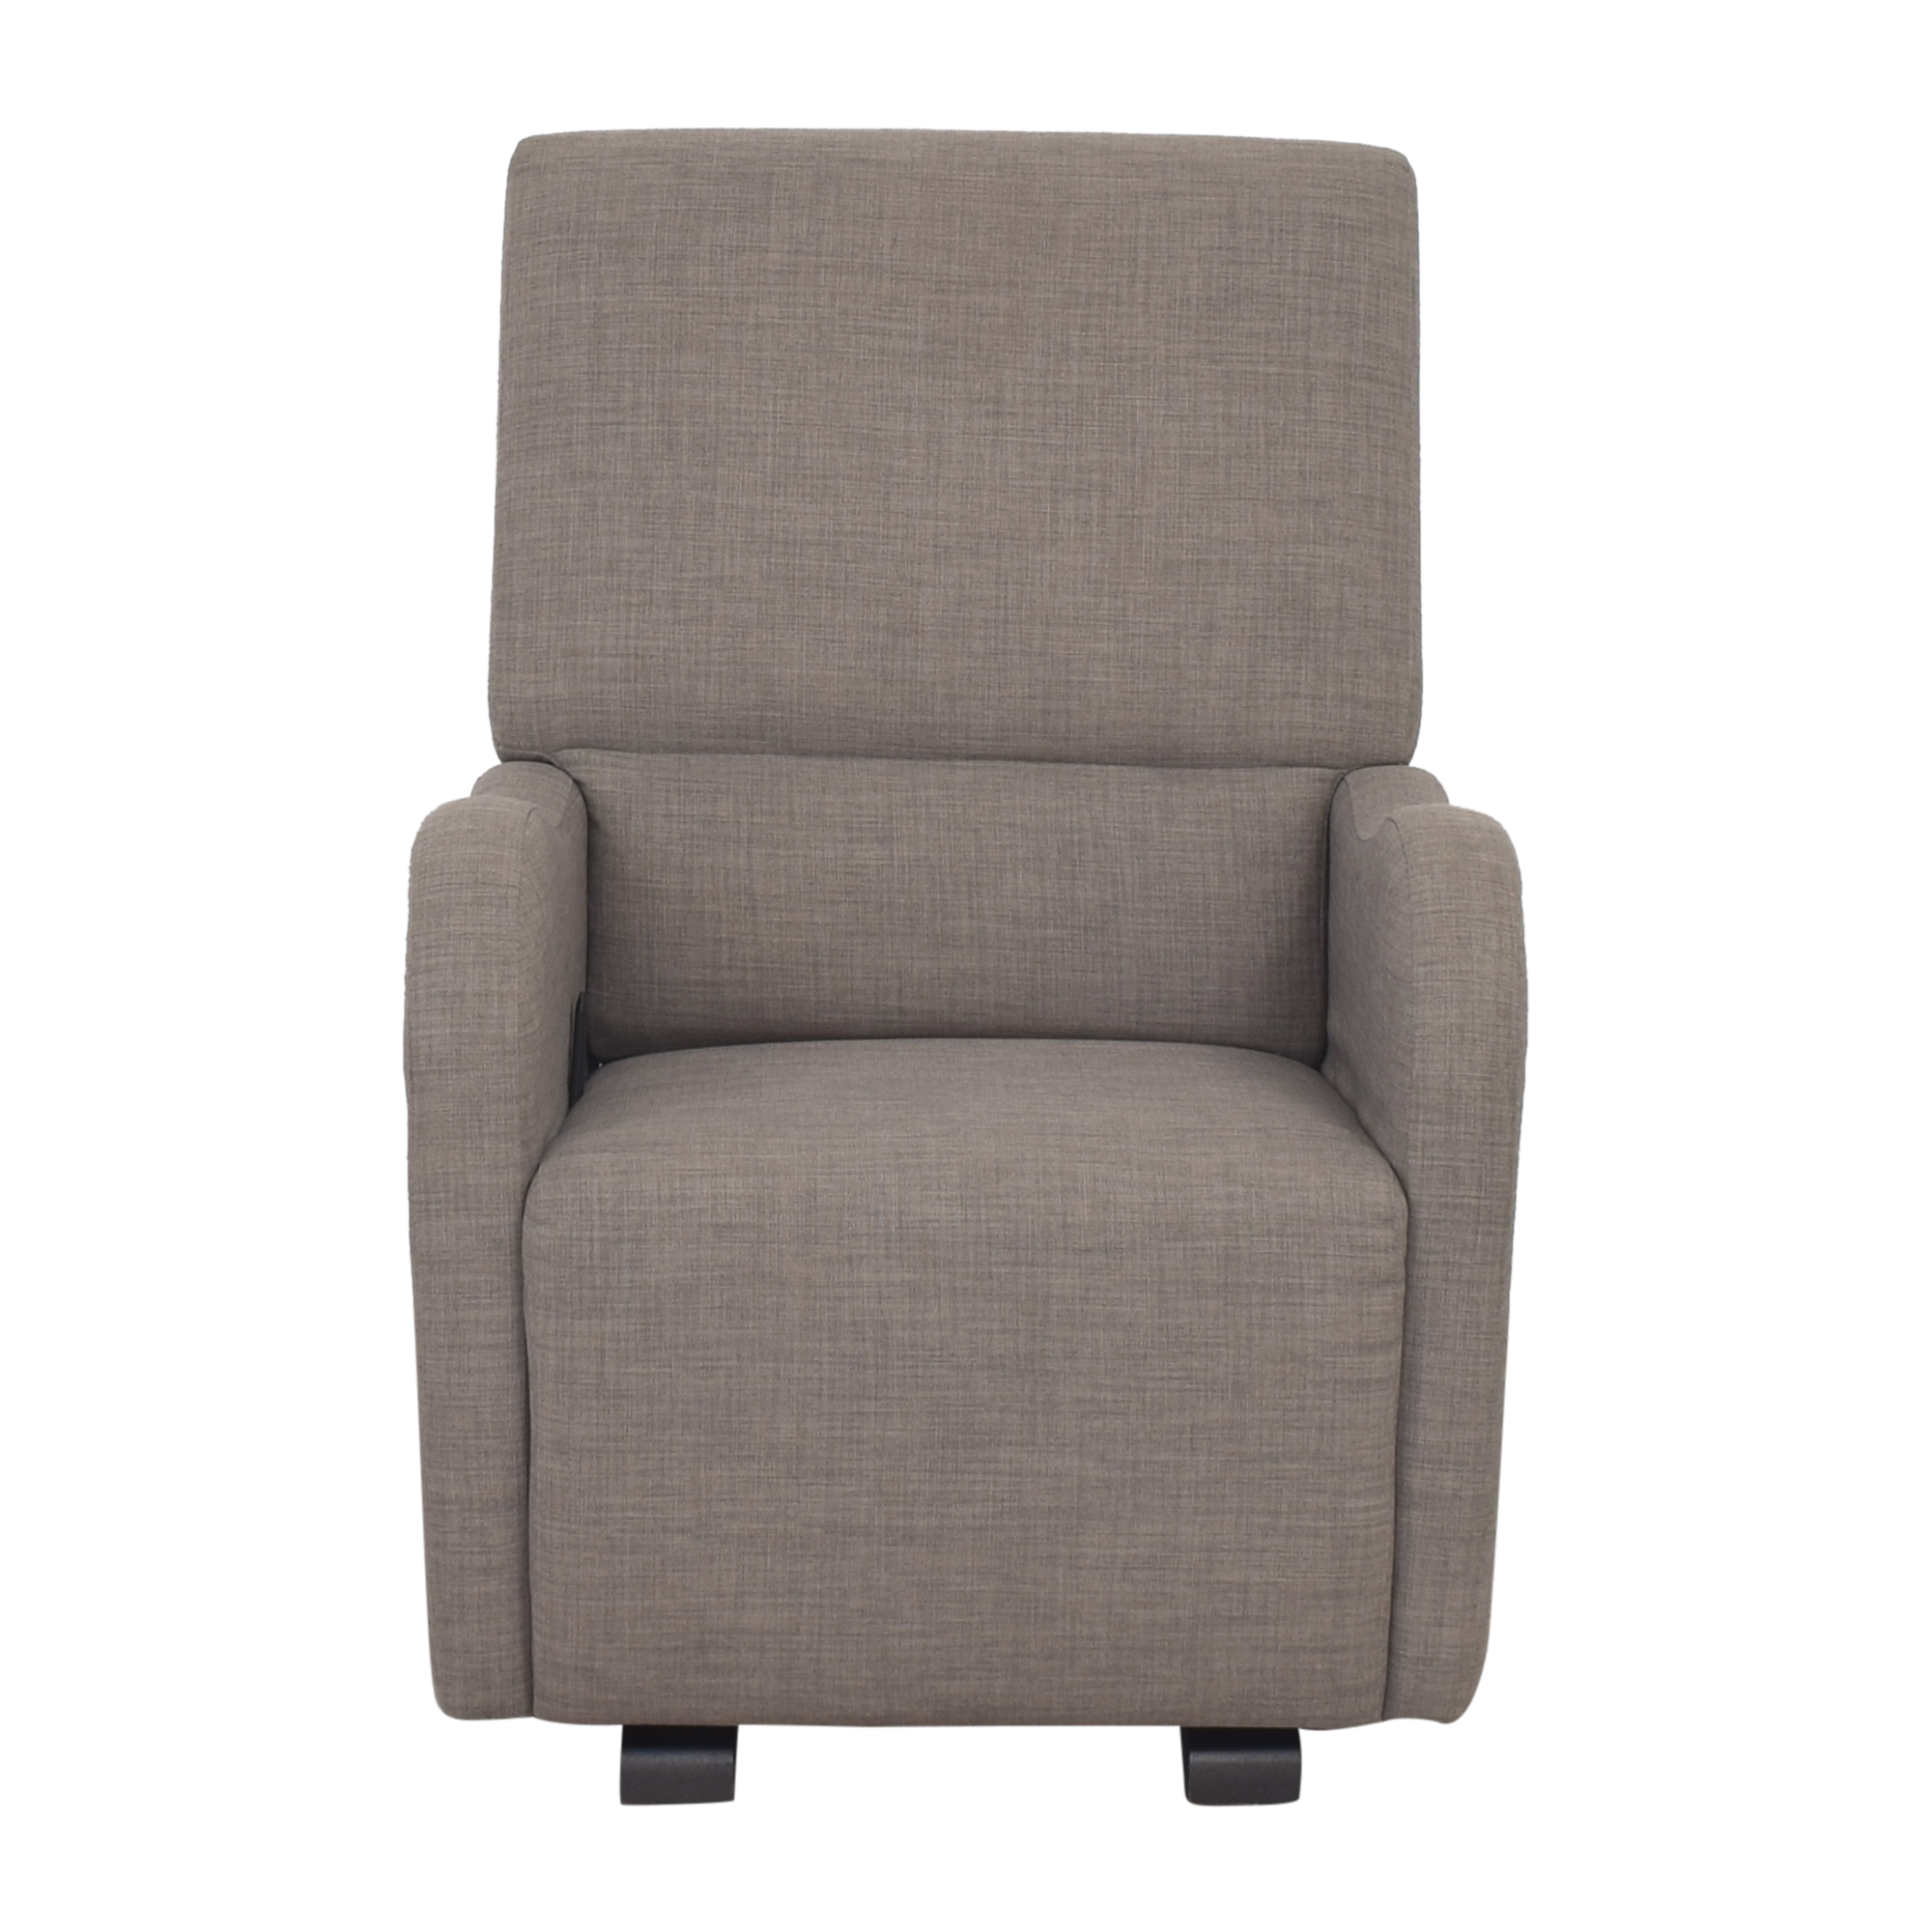 Dutailier Dutailier Verona Glider Chair coupon